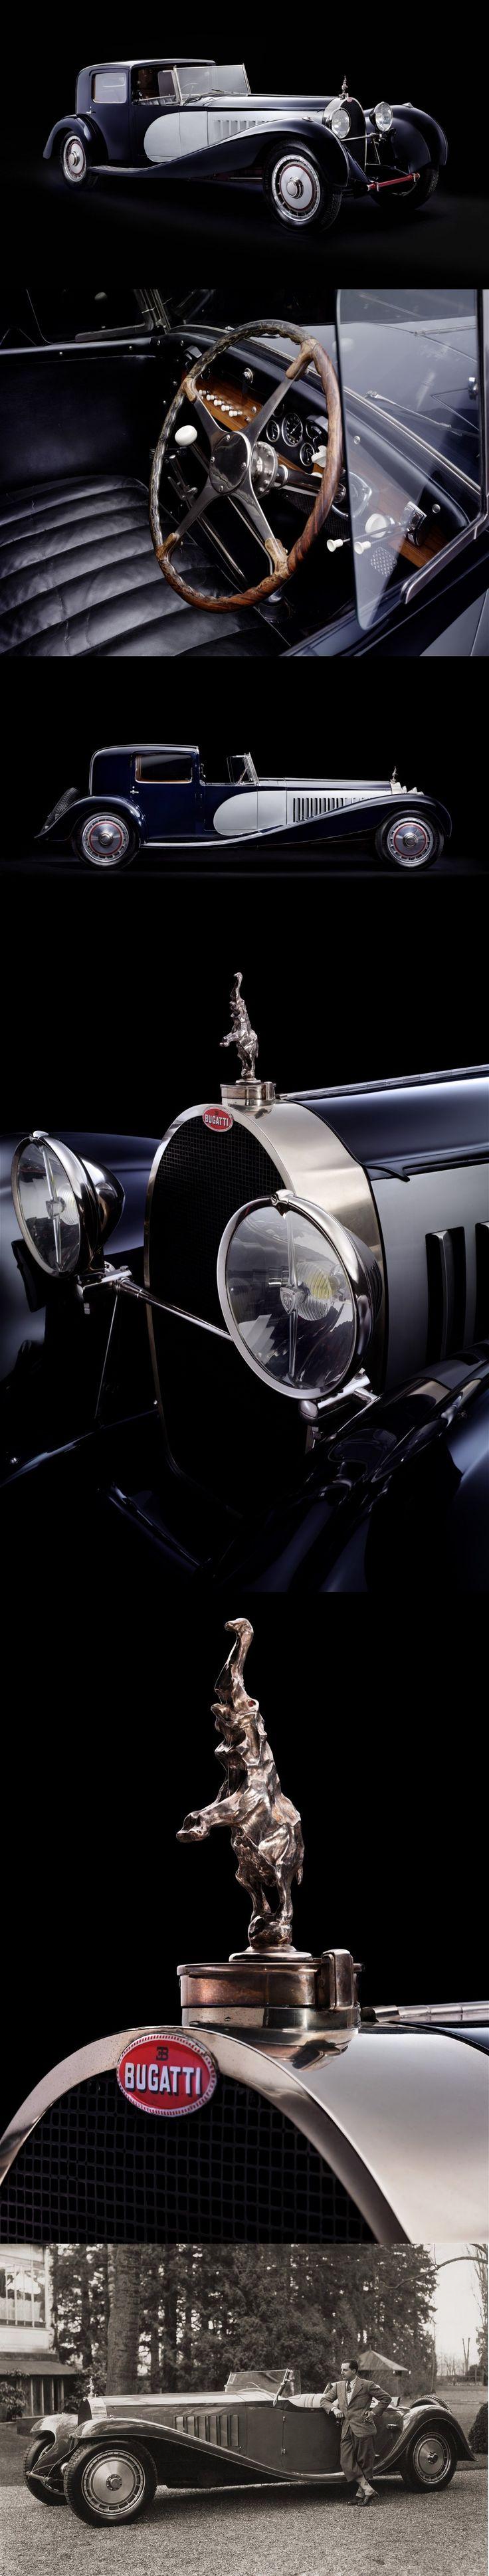 1932-bugatti-royale-type-41